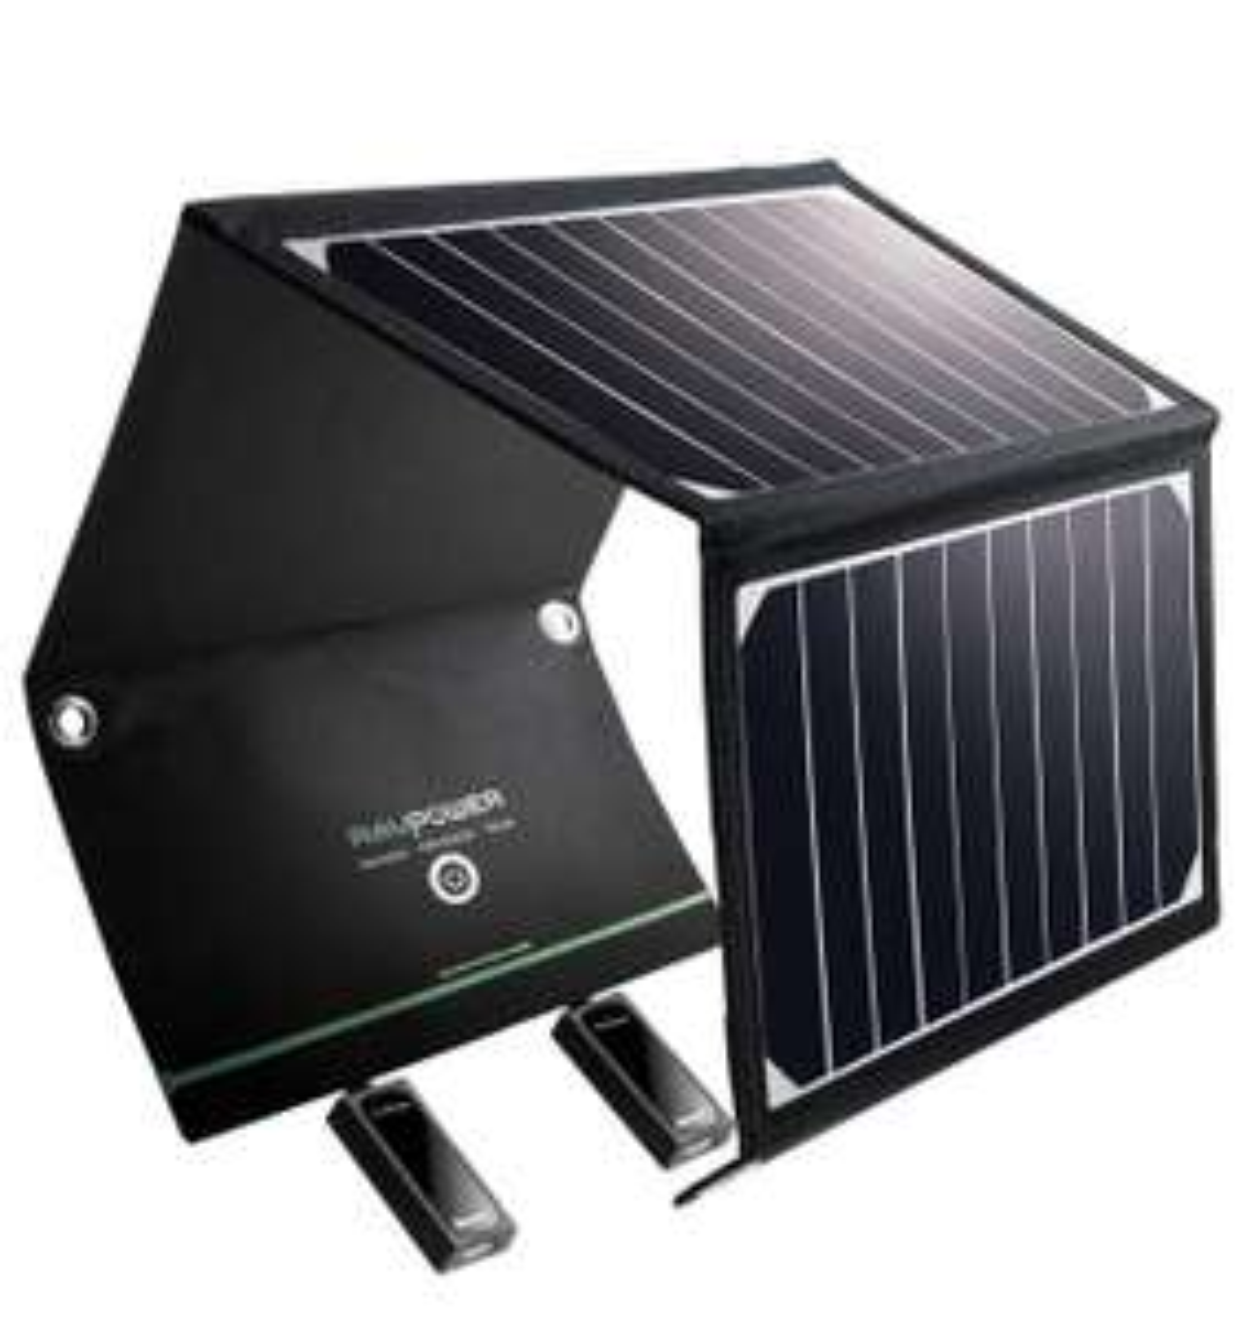 RAVPower 16W, 2 Port USB Solarladegerät